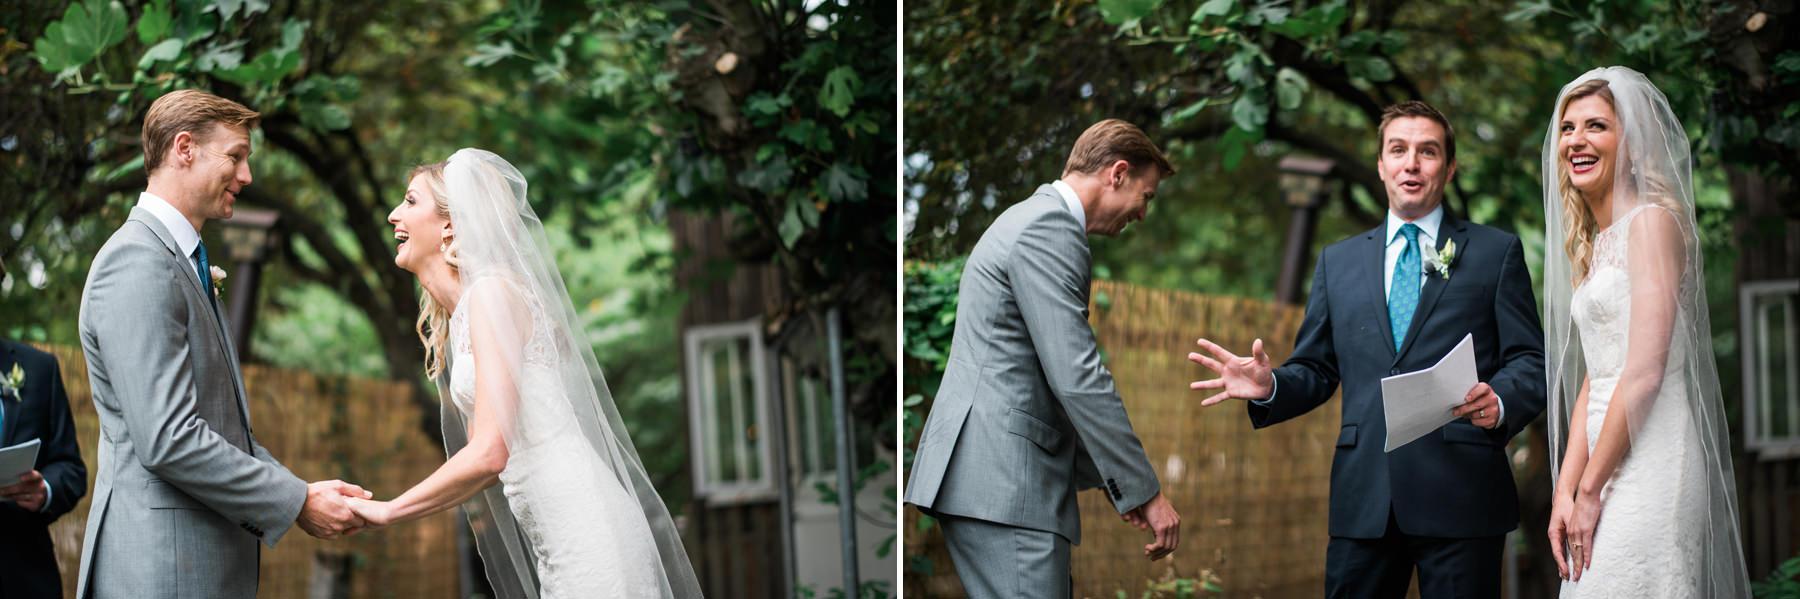 211-outdoor-wedding-ceremony-at-the-corson-building.jpg